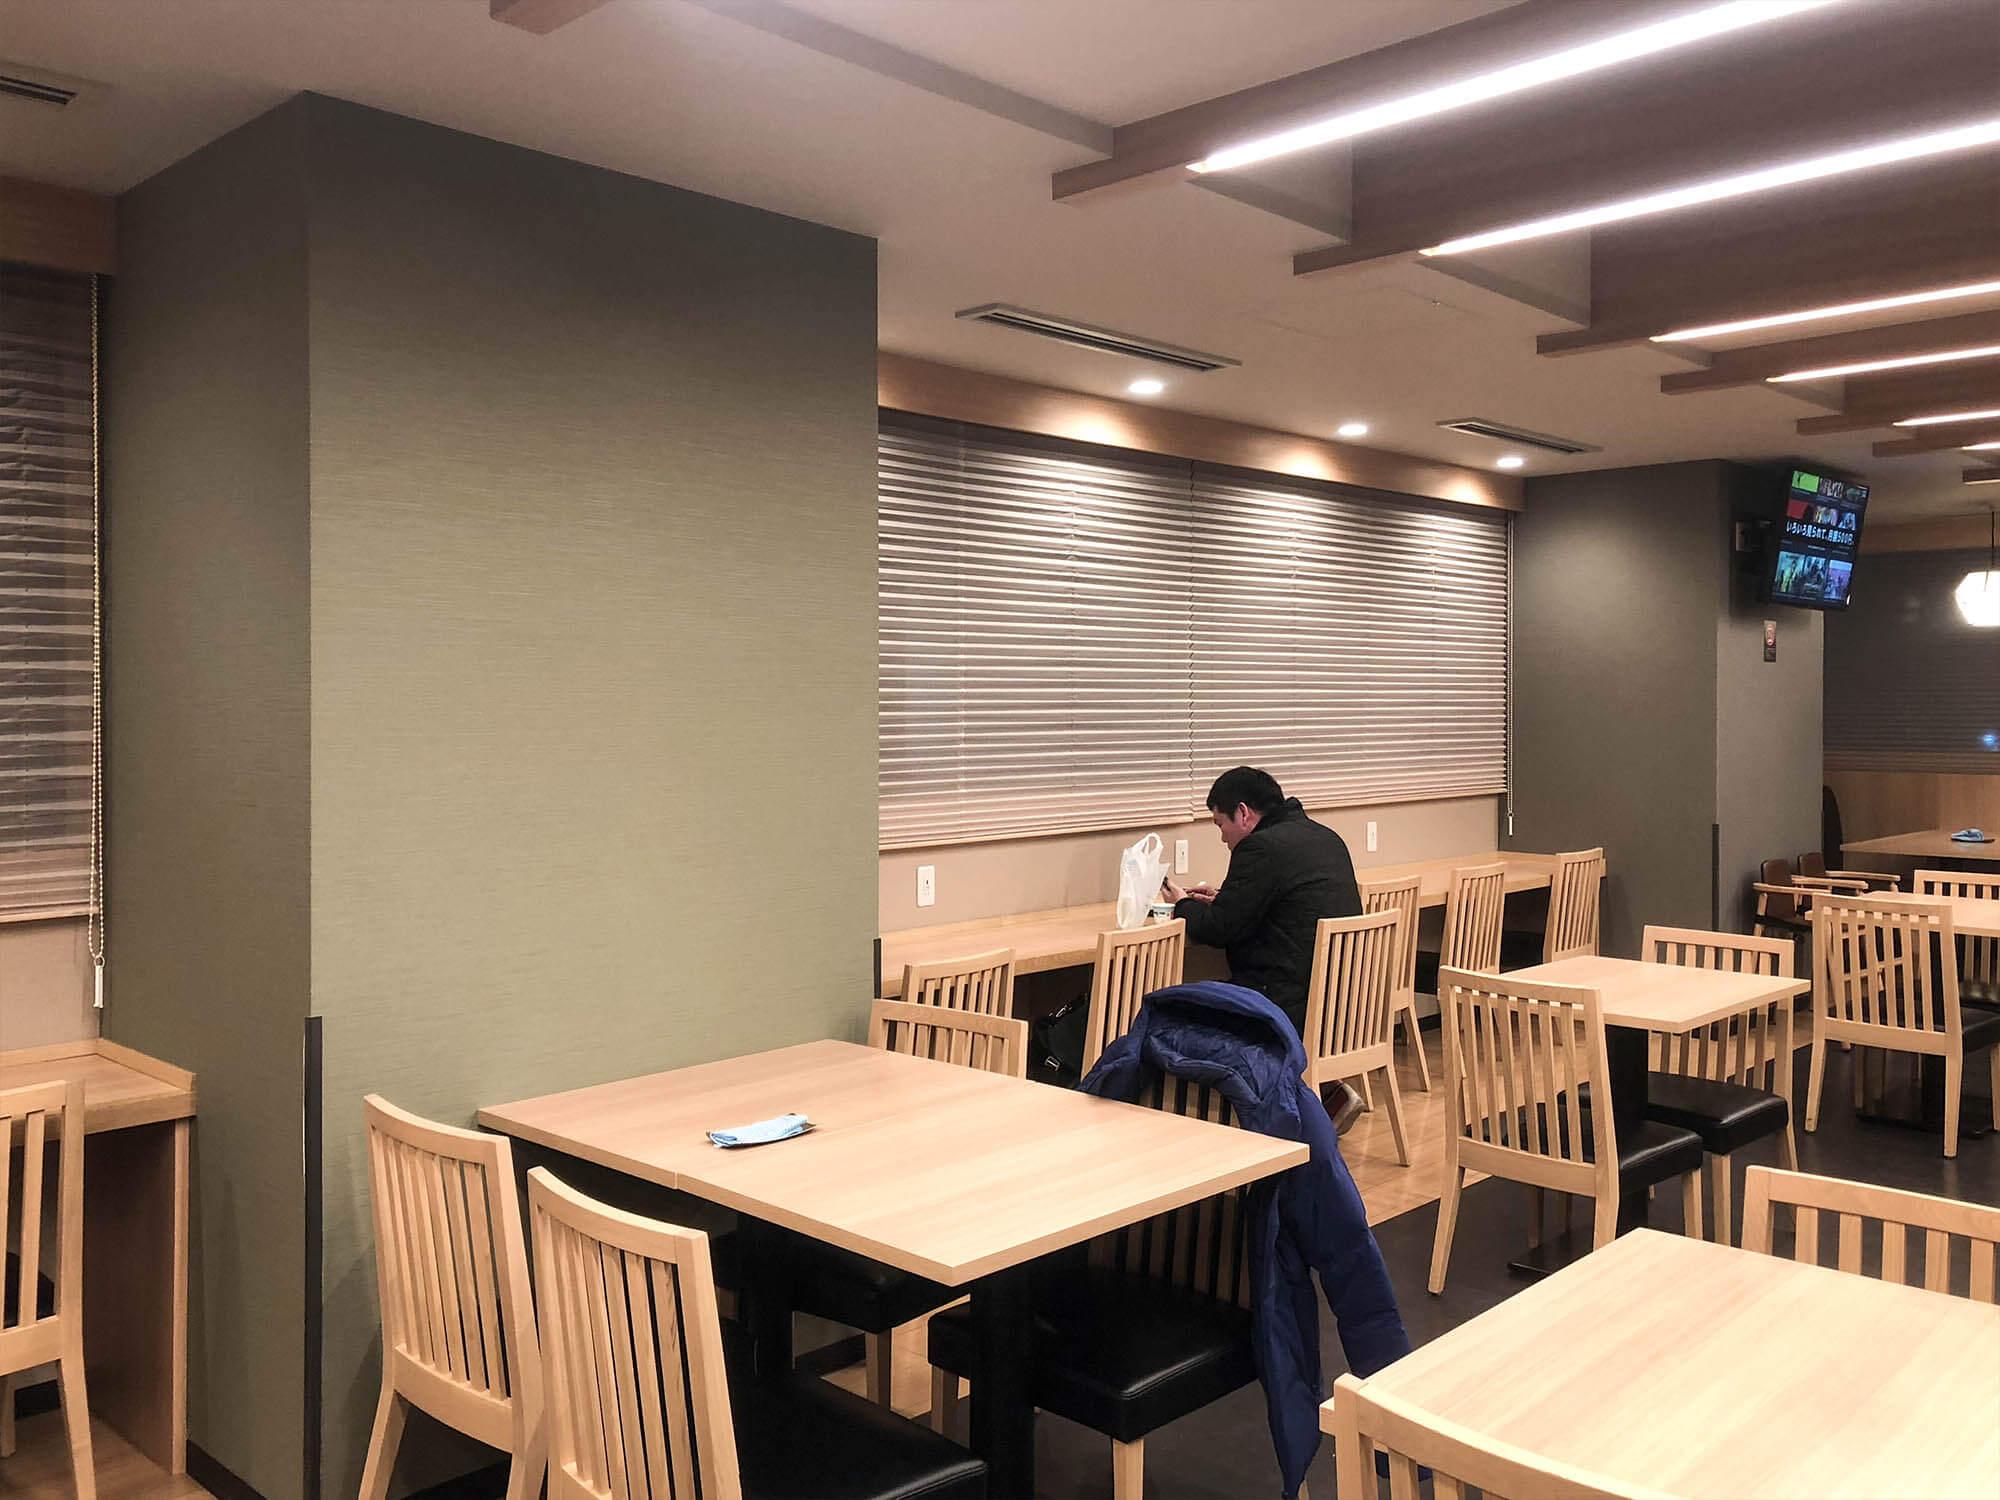 Dormyinn日本橋_hatago餐廳座位席